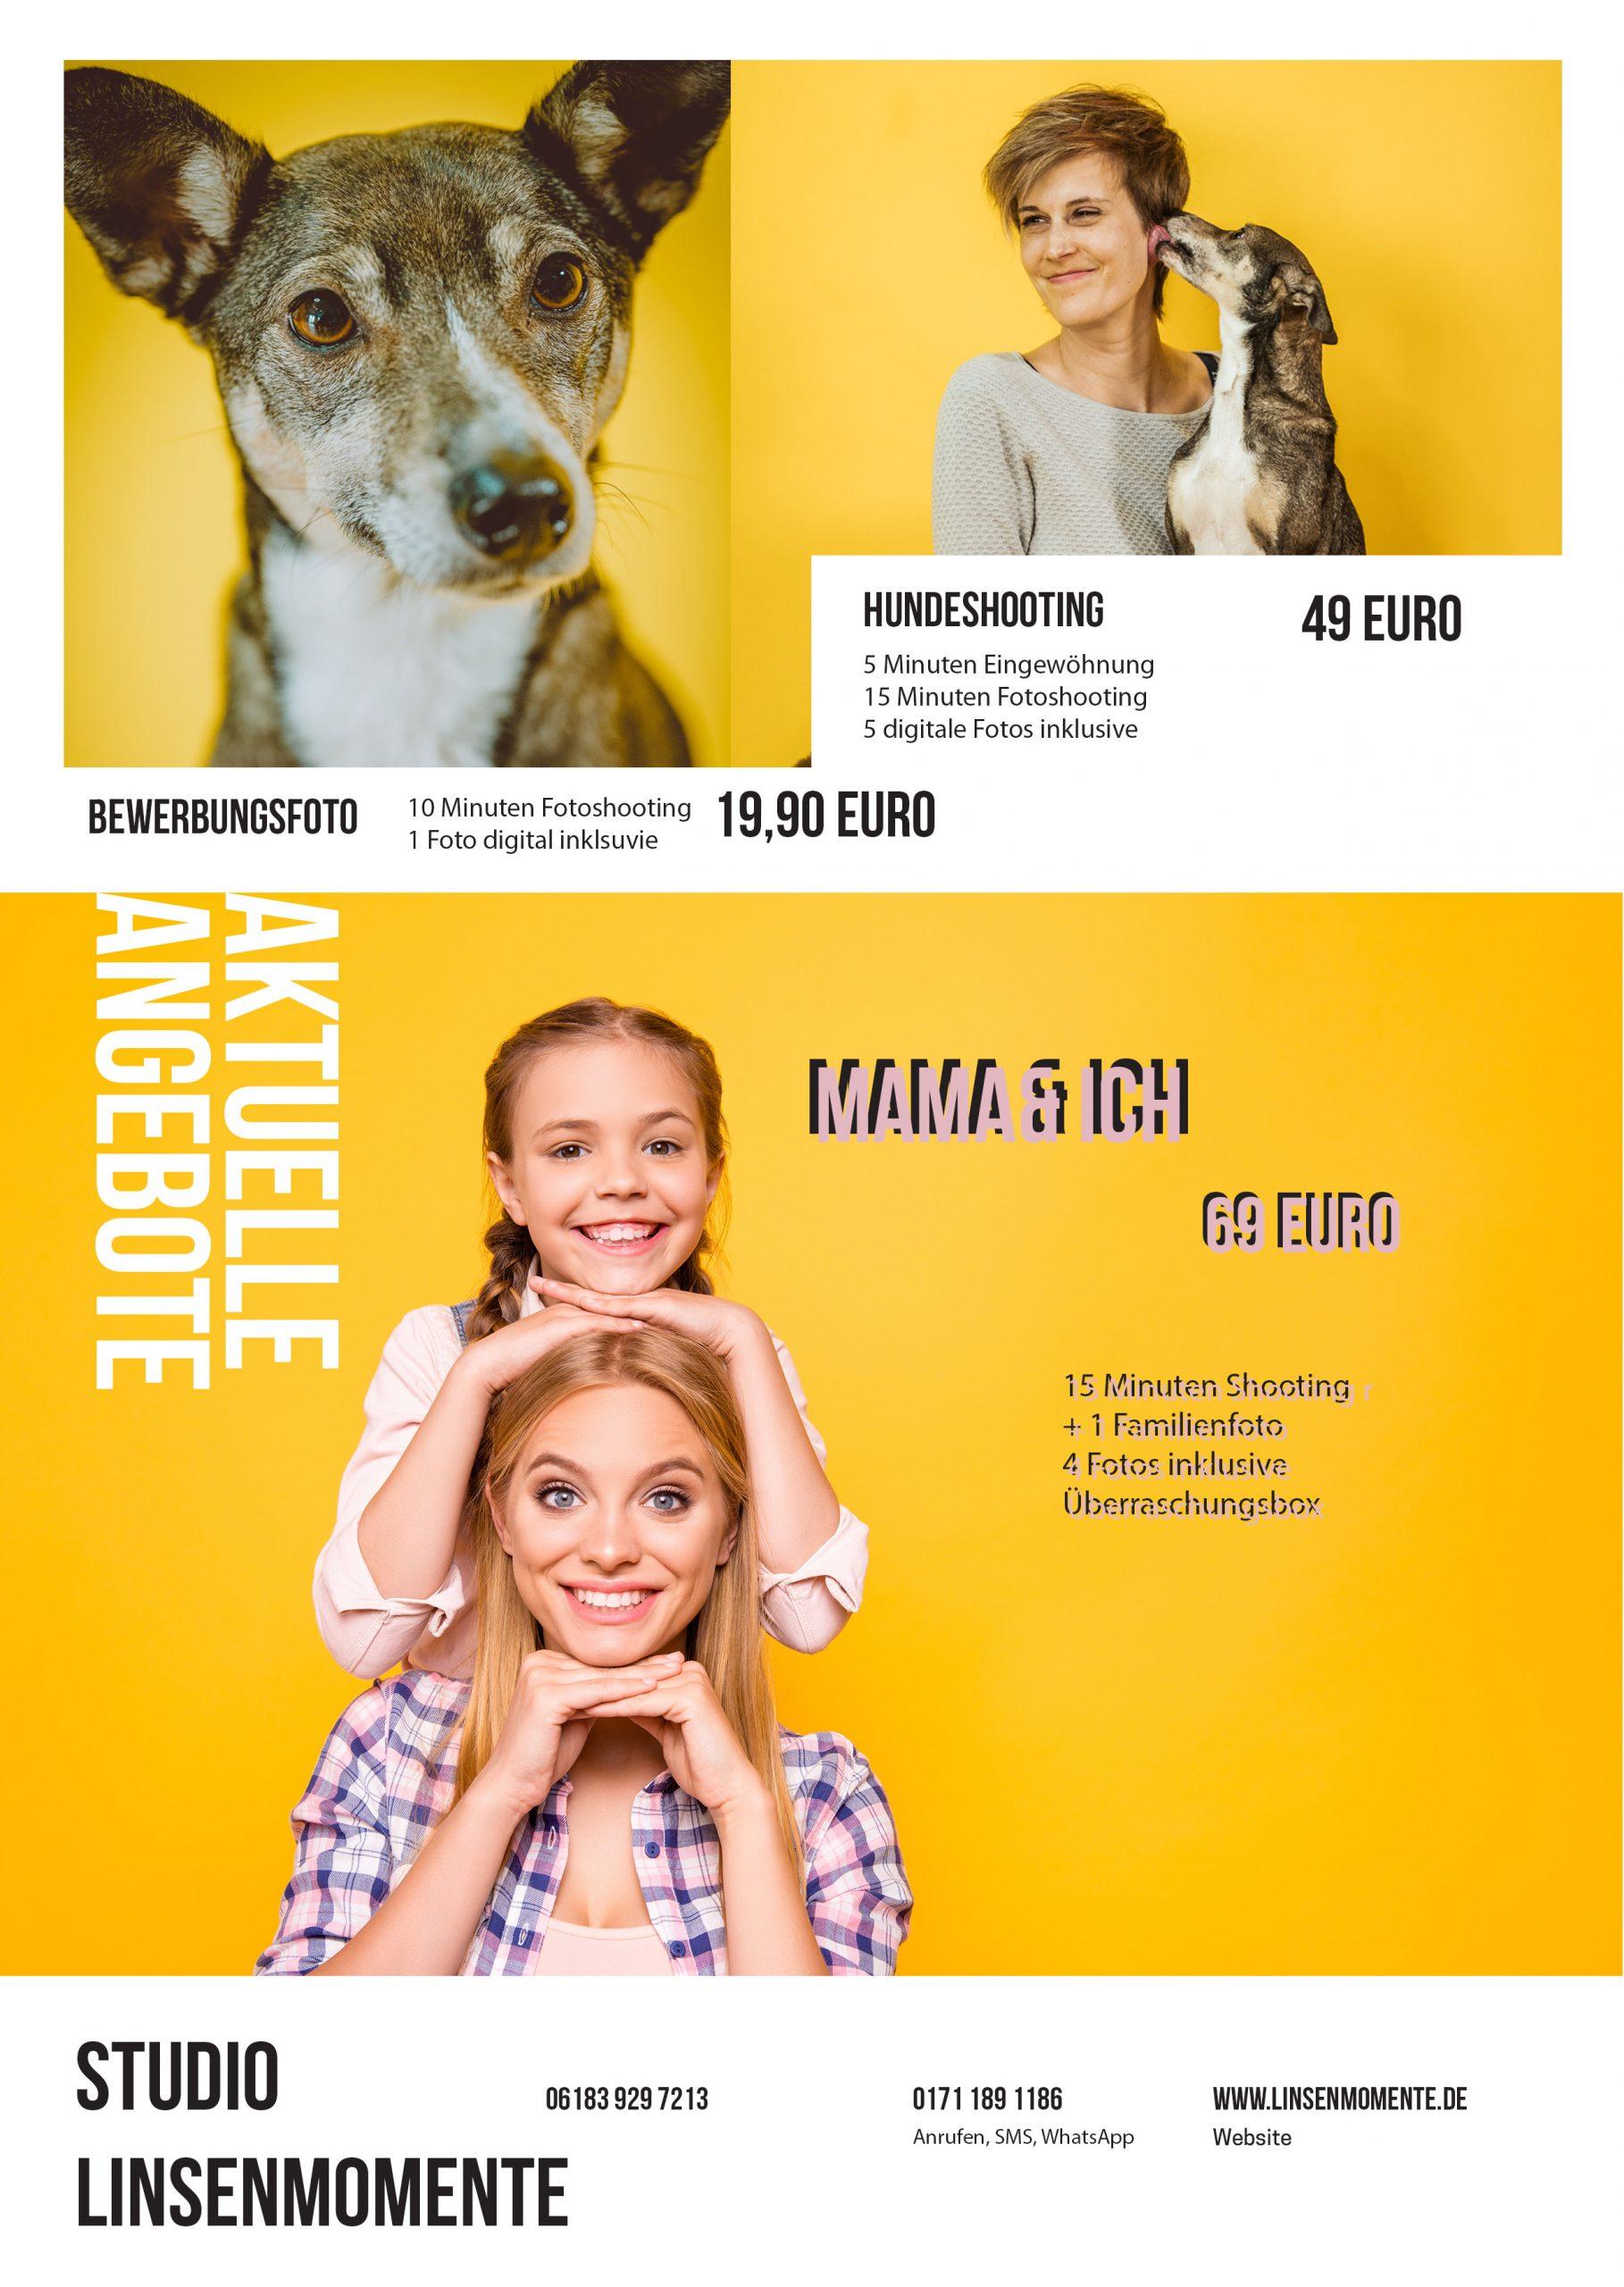 Fotoshooting Angebot Muttertag Hanau